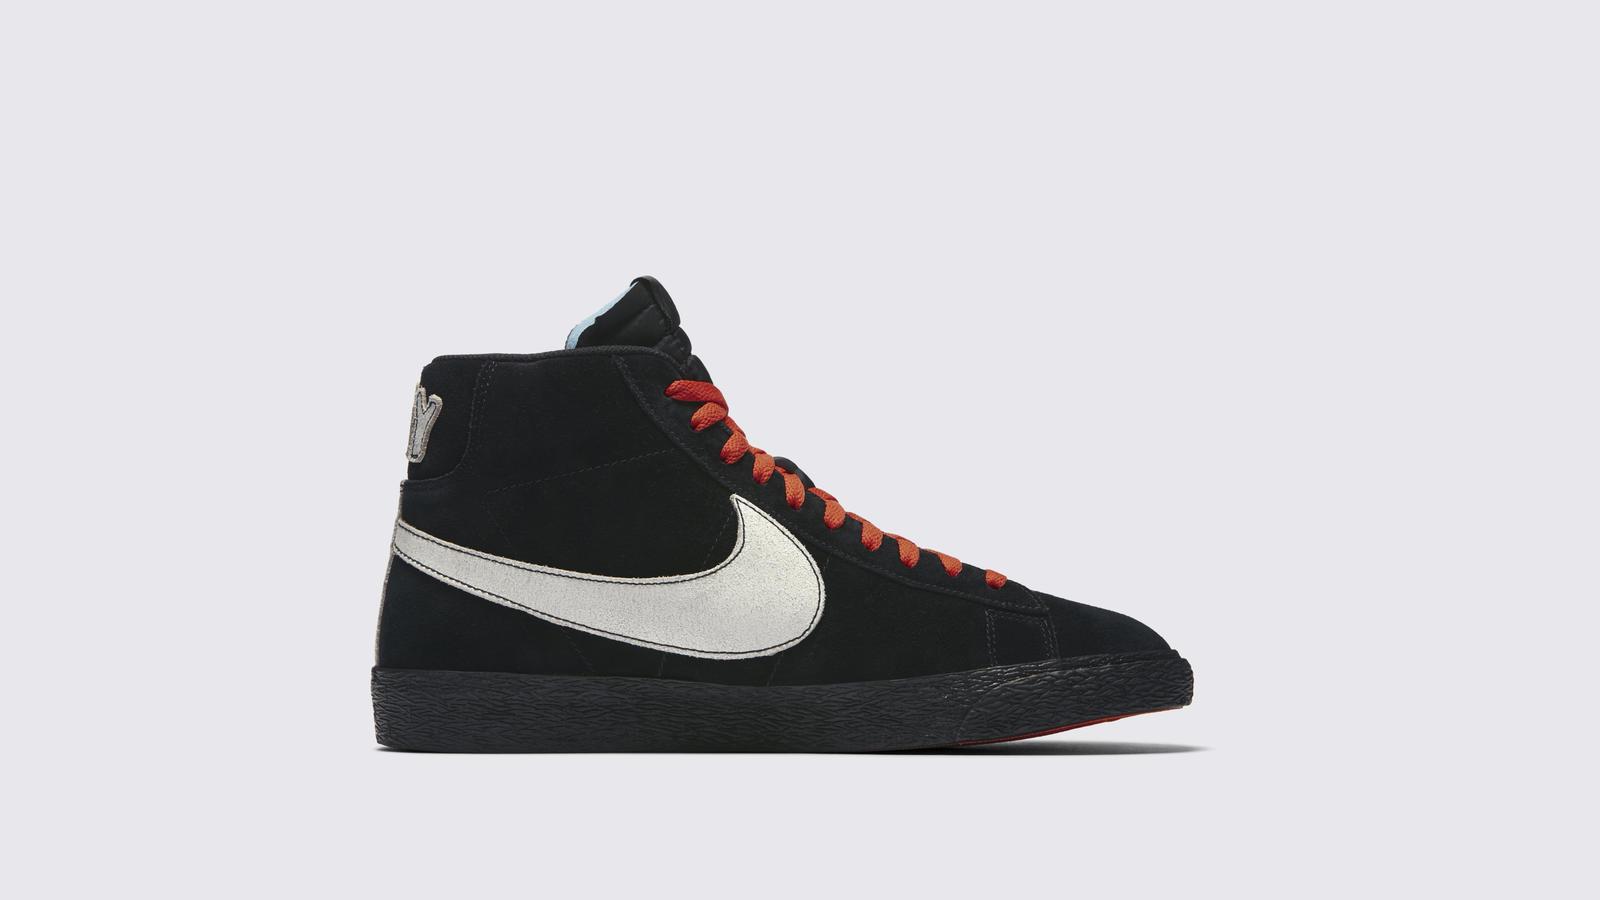 Sheck Wes Nike Air Max 95 and Blazer